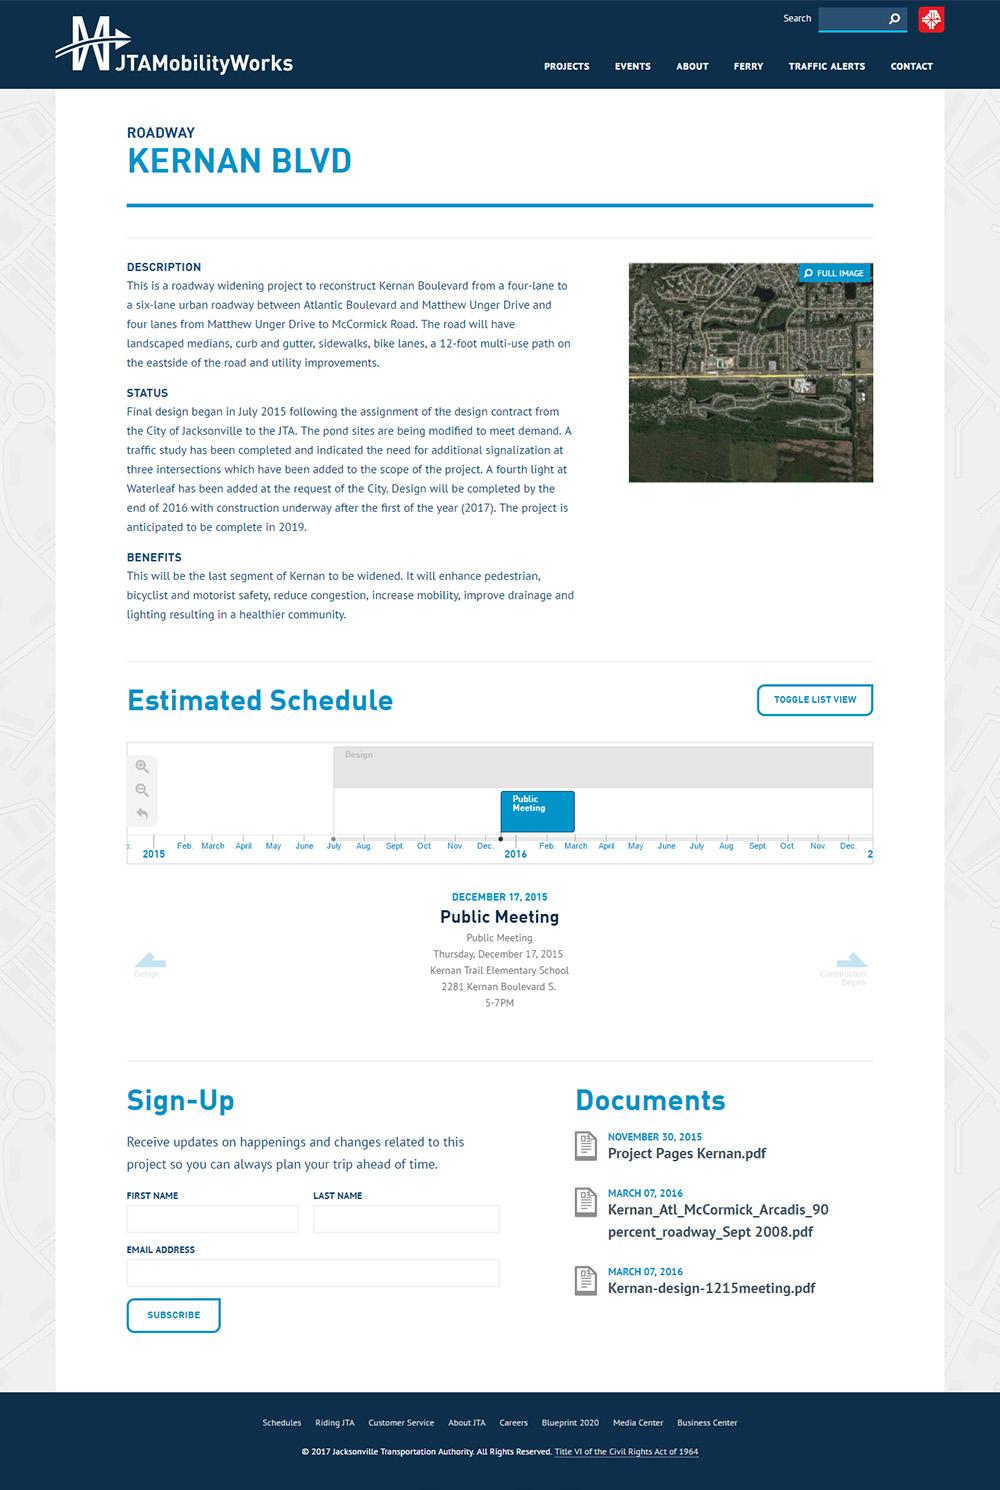 JTAMobilityWorks Project Page